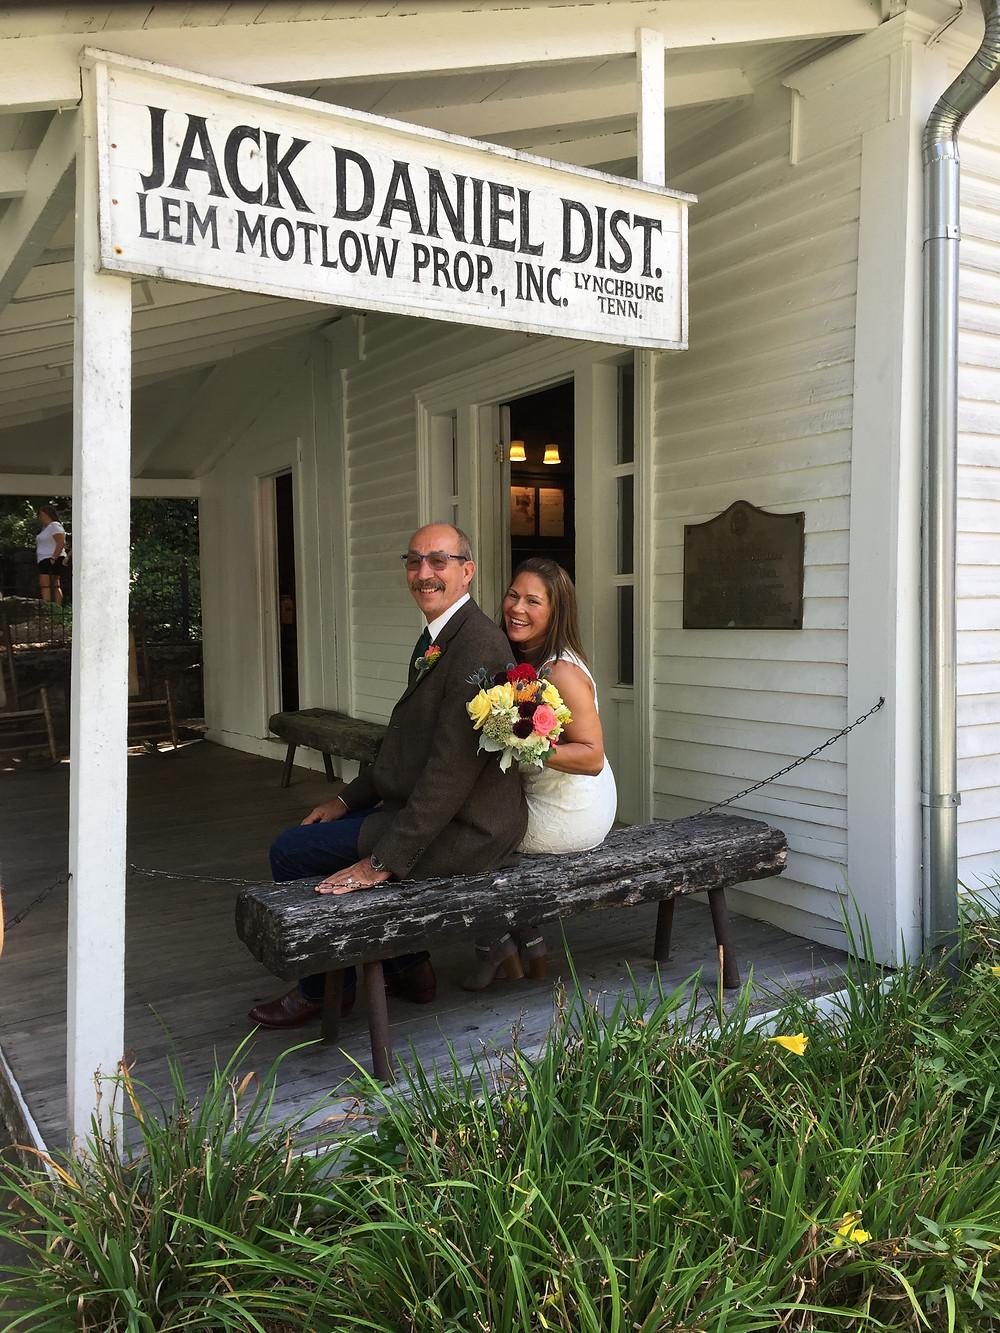 Jack Daniel's Wedding